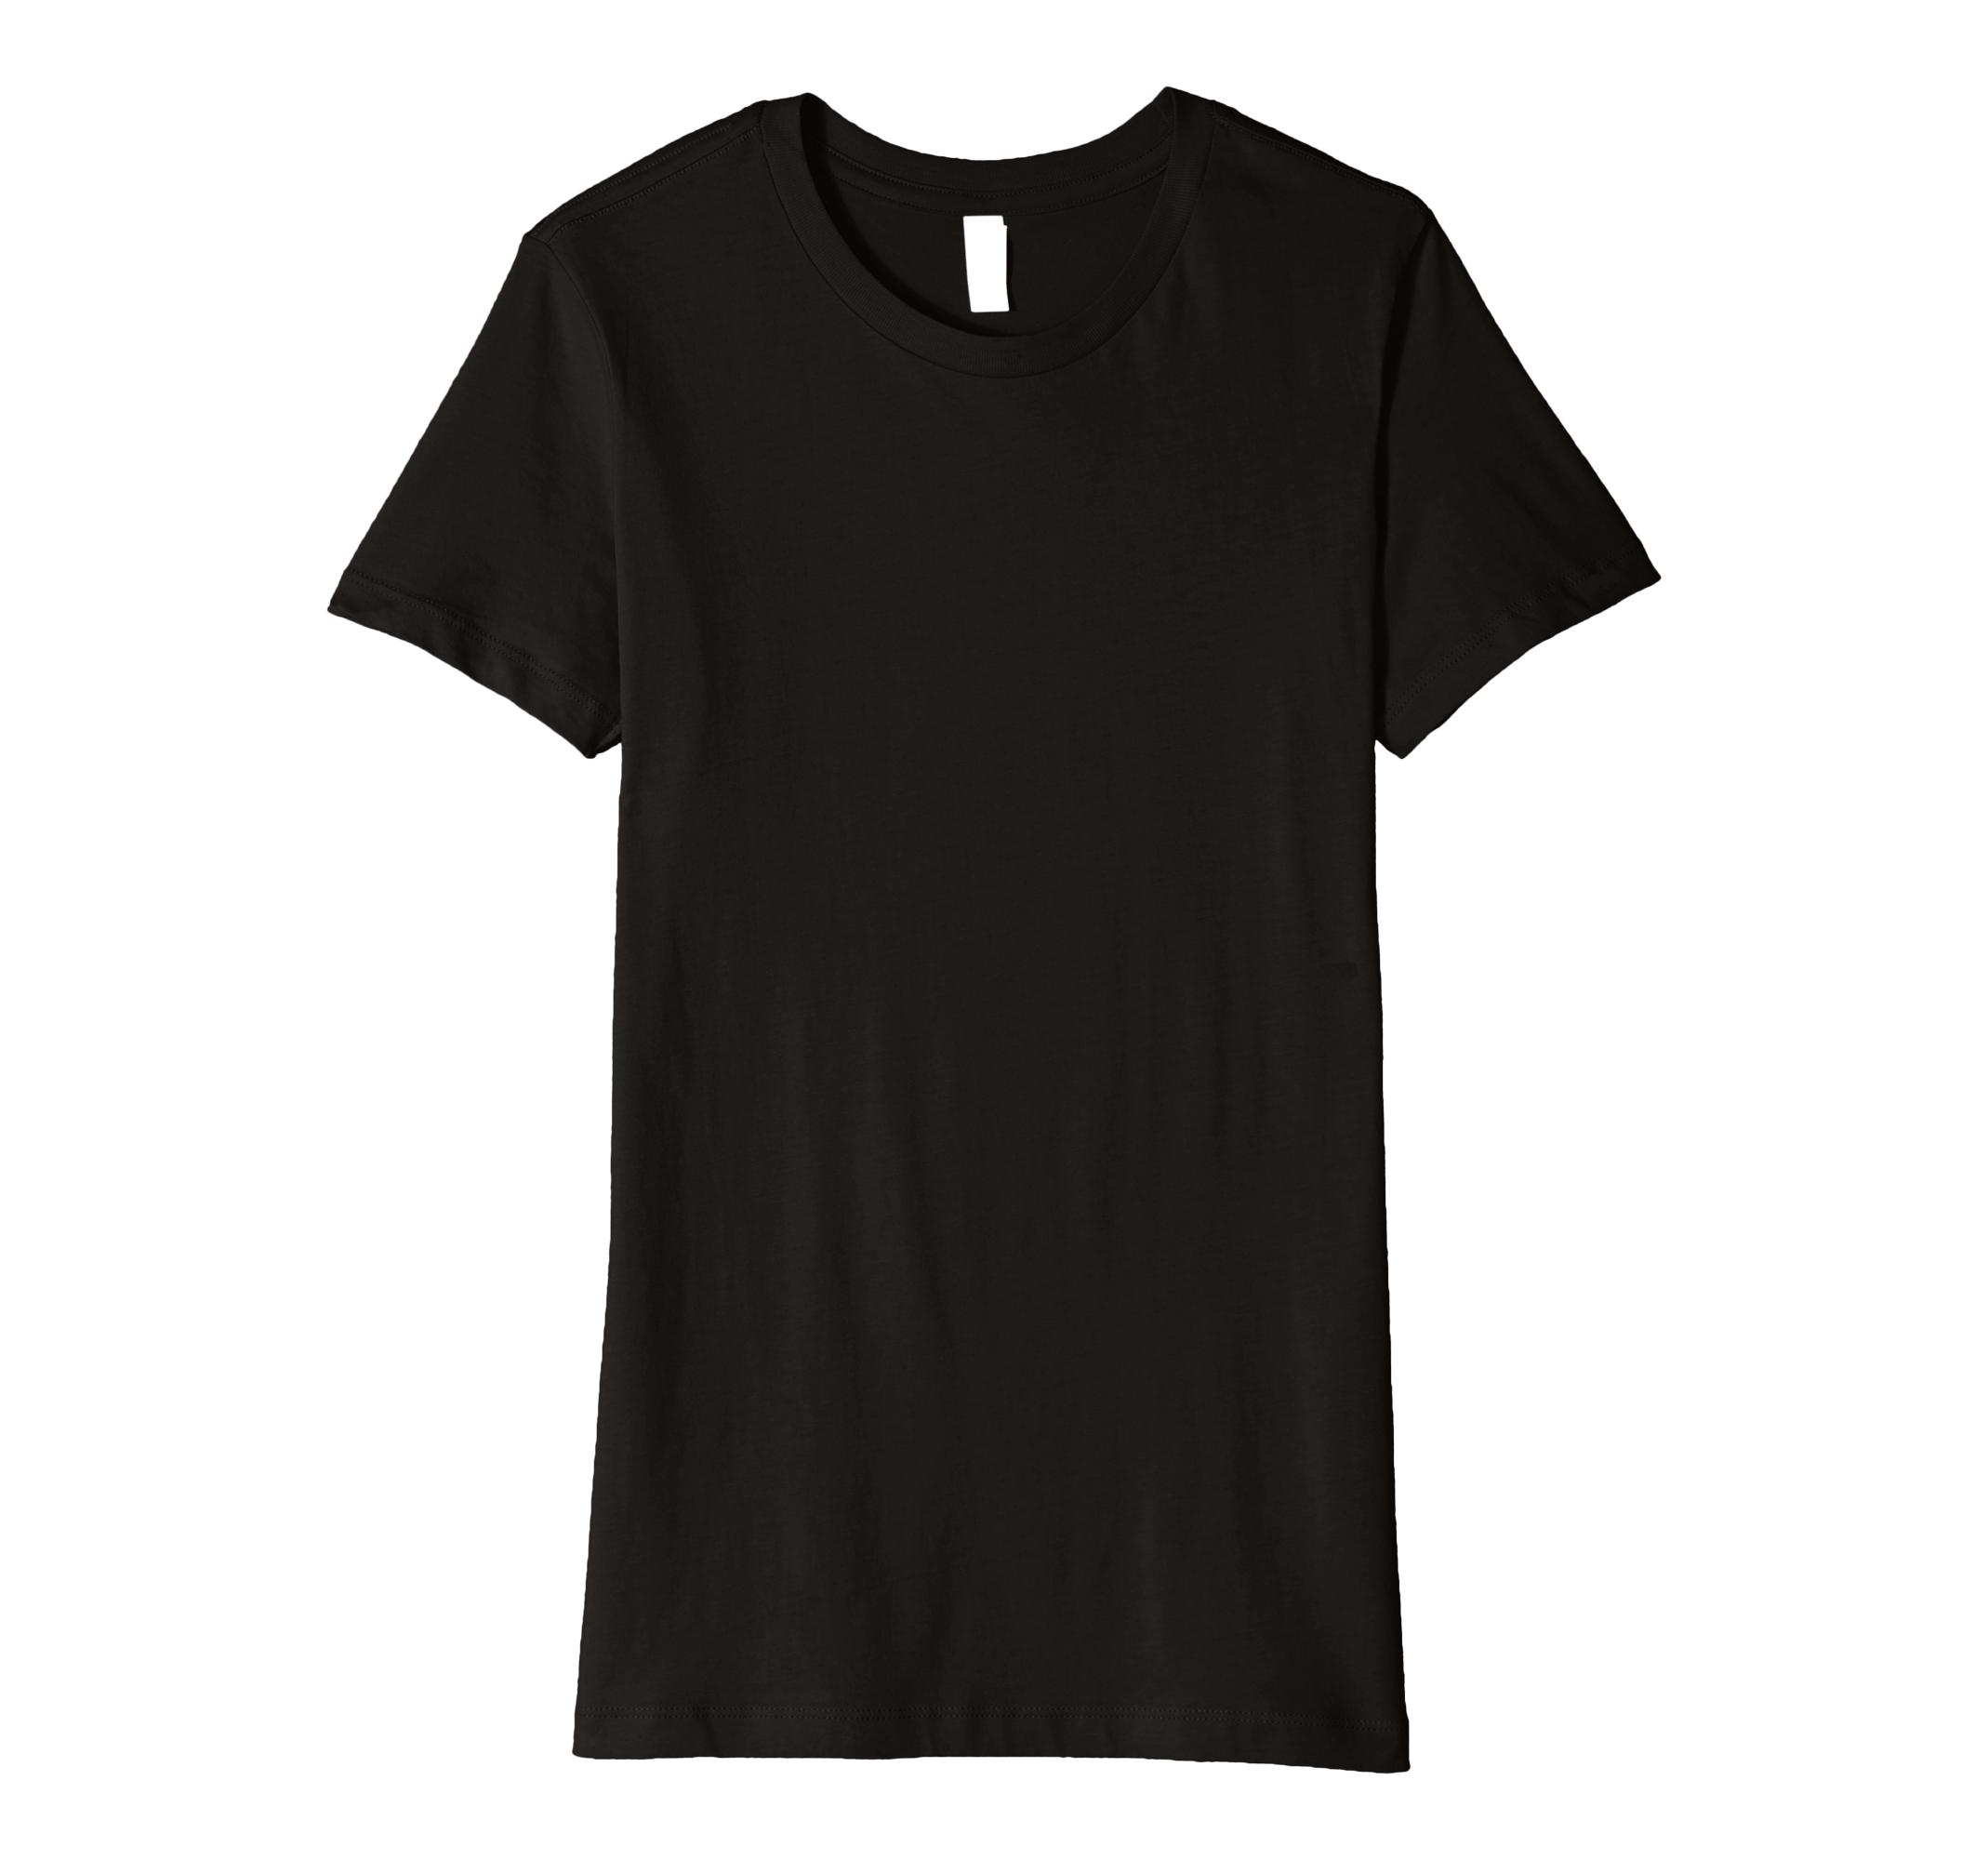 T-shirts Humorous Funny Graphic Print T Shirt Men Tops Tees Corgi Women T-shirt Short Sleeve Casual Tshirts